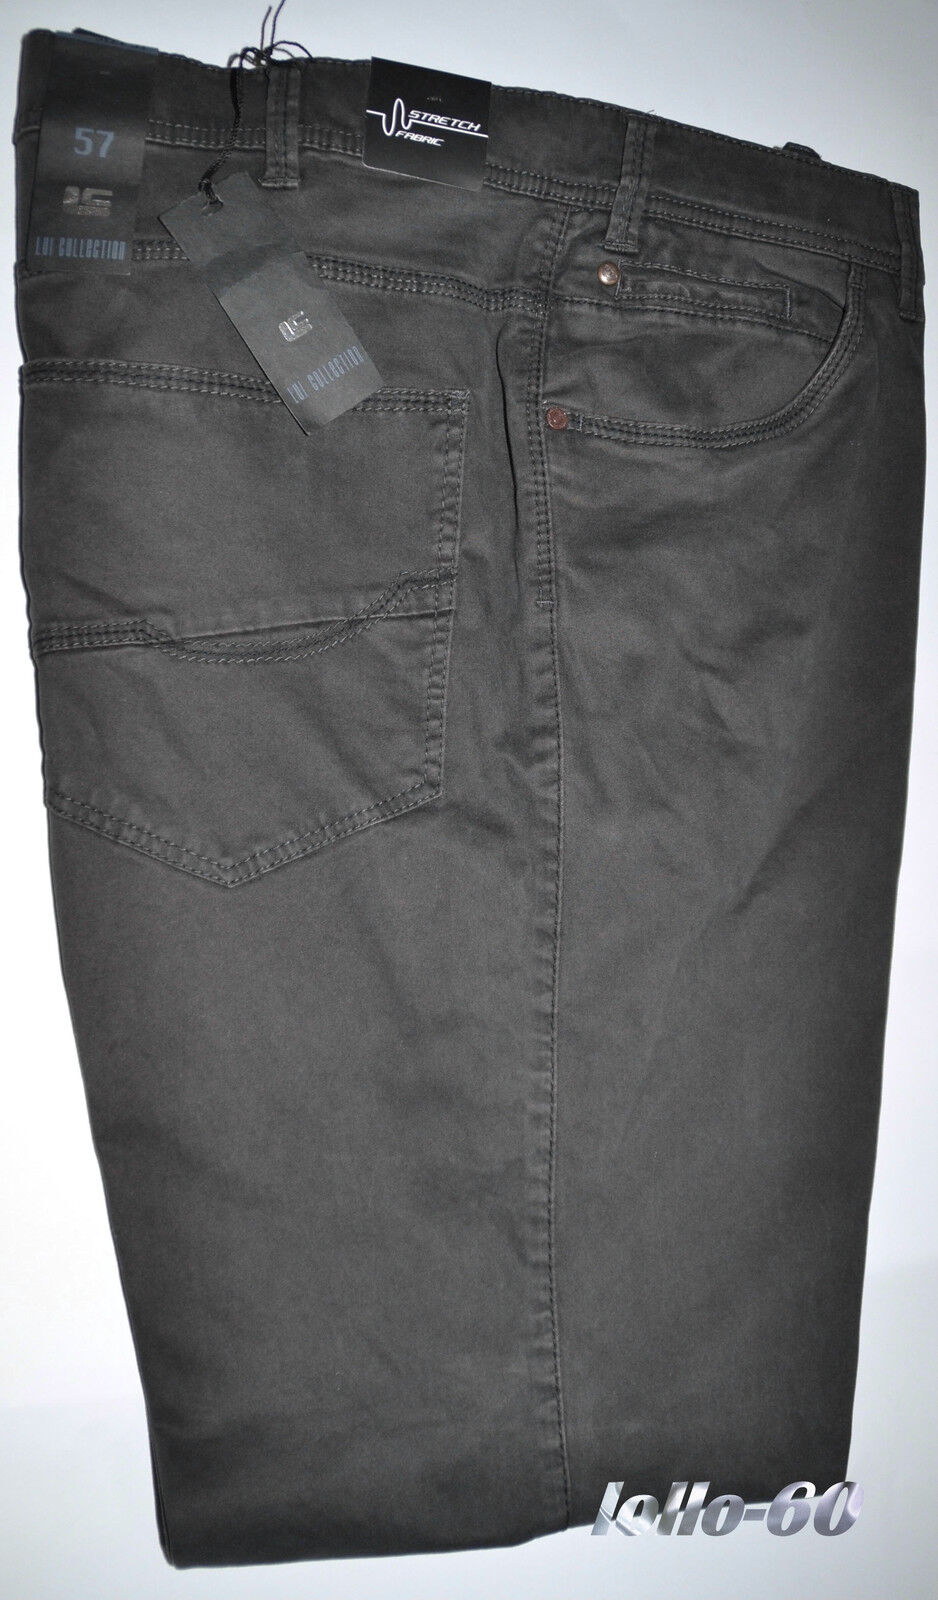 Men's trousers PLUS SIZES 59 MODE warm cotton stretch outsize grey